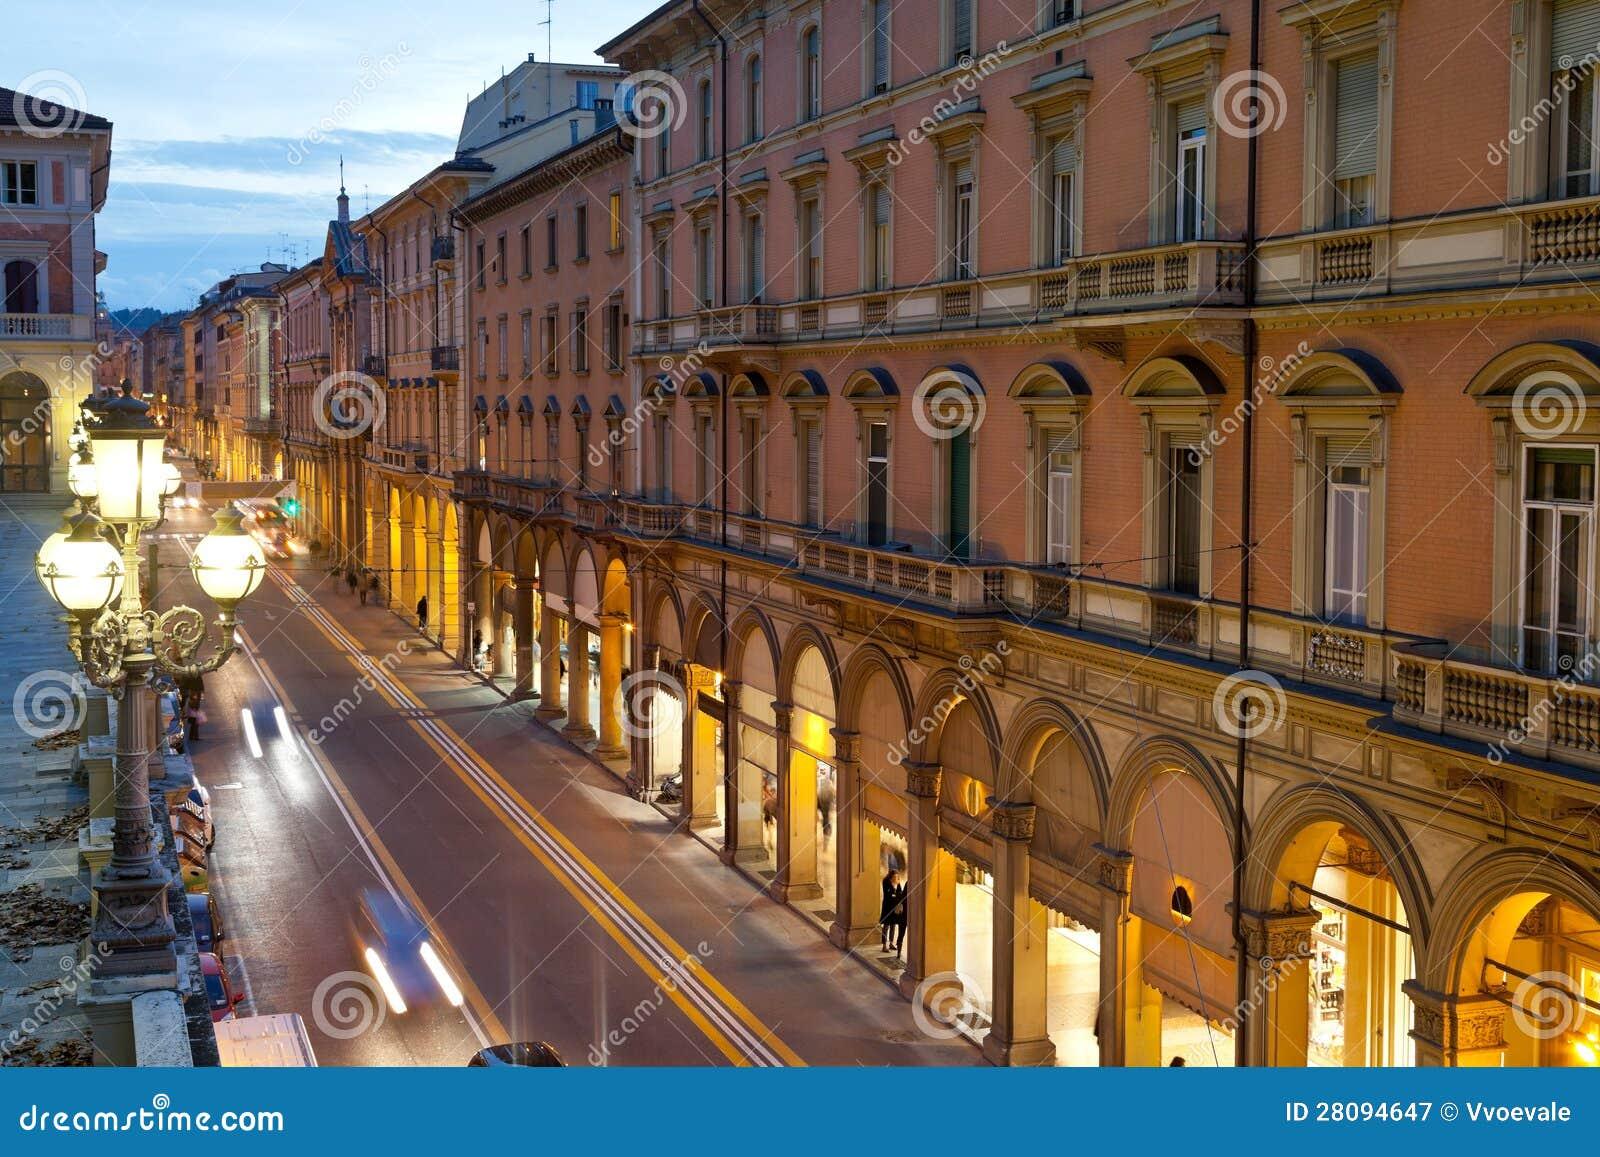 Via dell indipendenza in bologna italy stock image for Bershka via indipendenza bologna